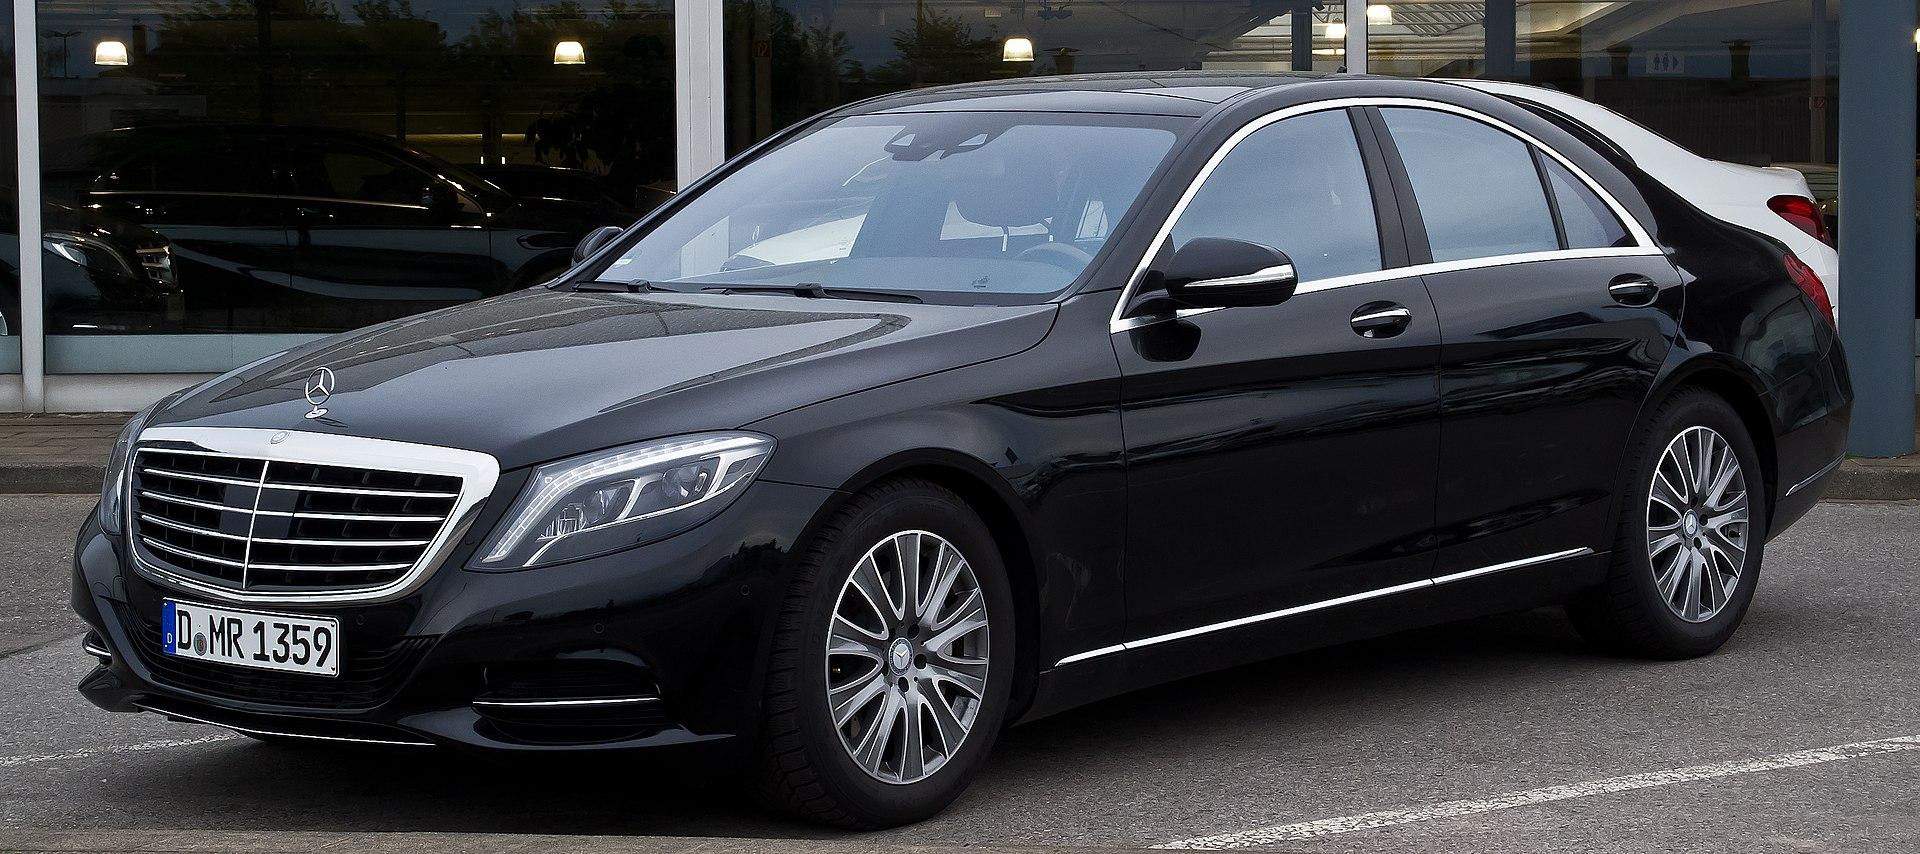 Mercedes-Benz W222 - Wikipedia